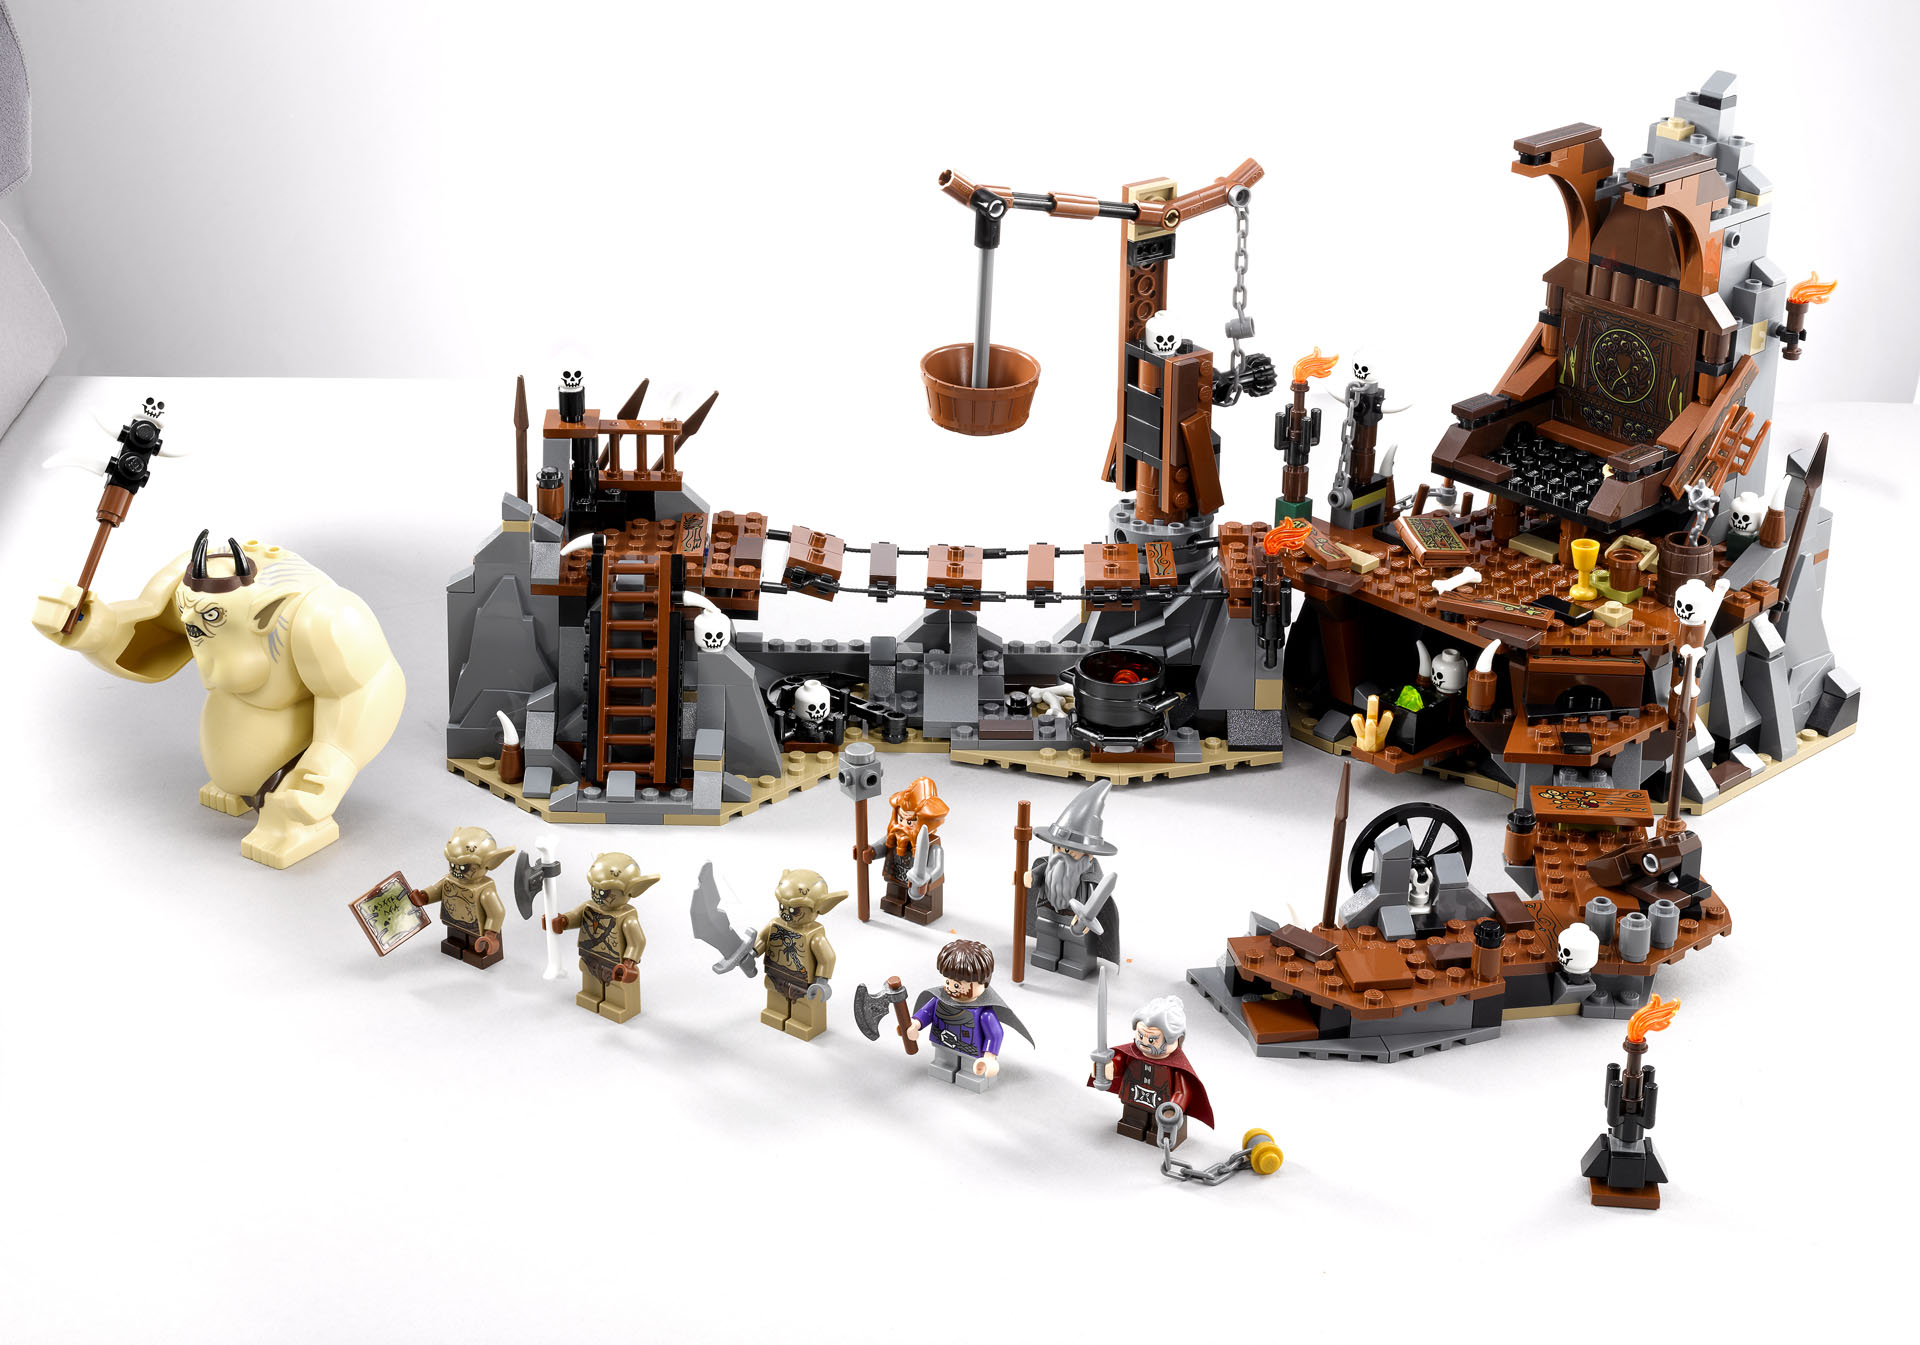 lego hobbit goblin king | eBay